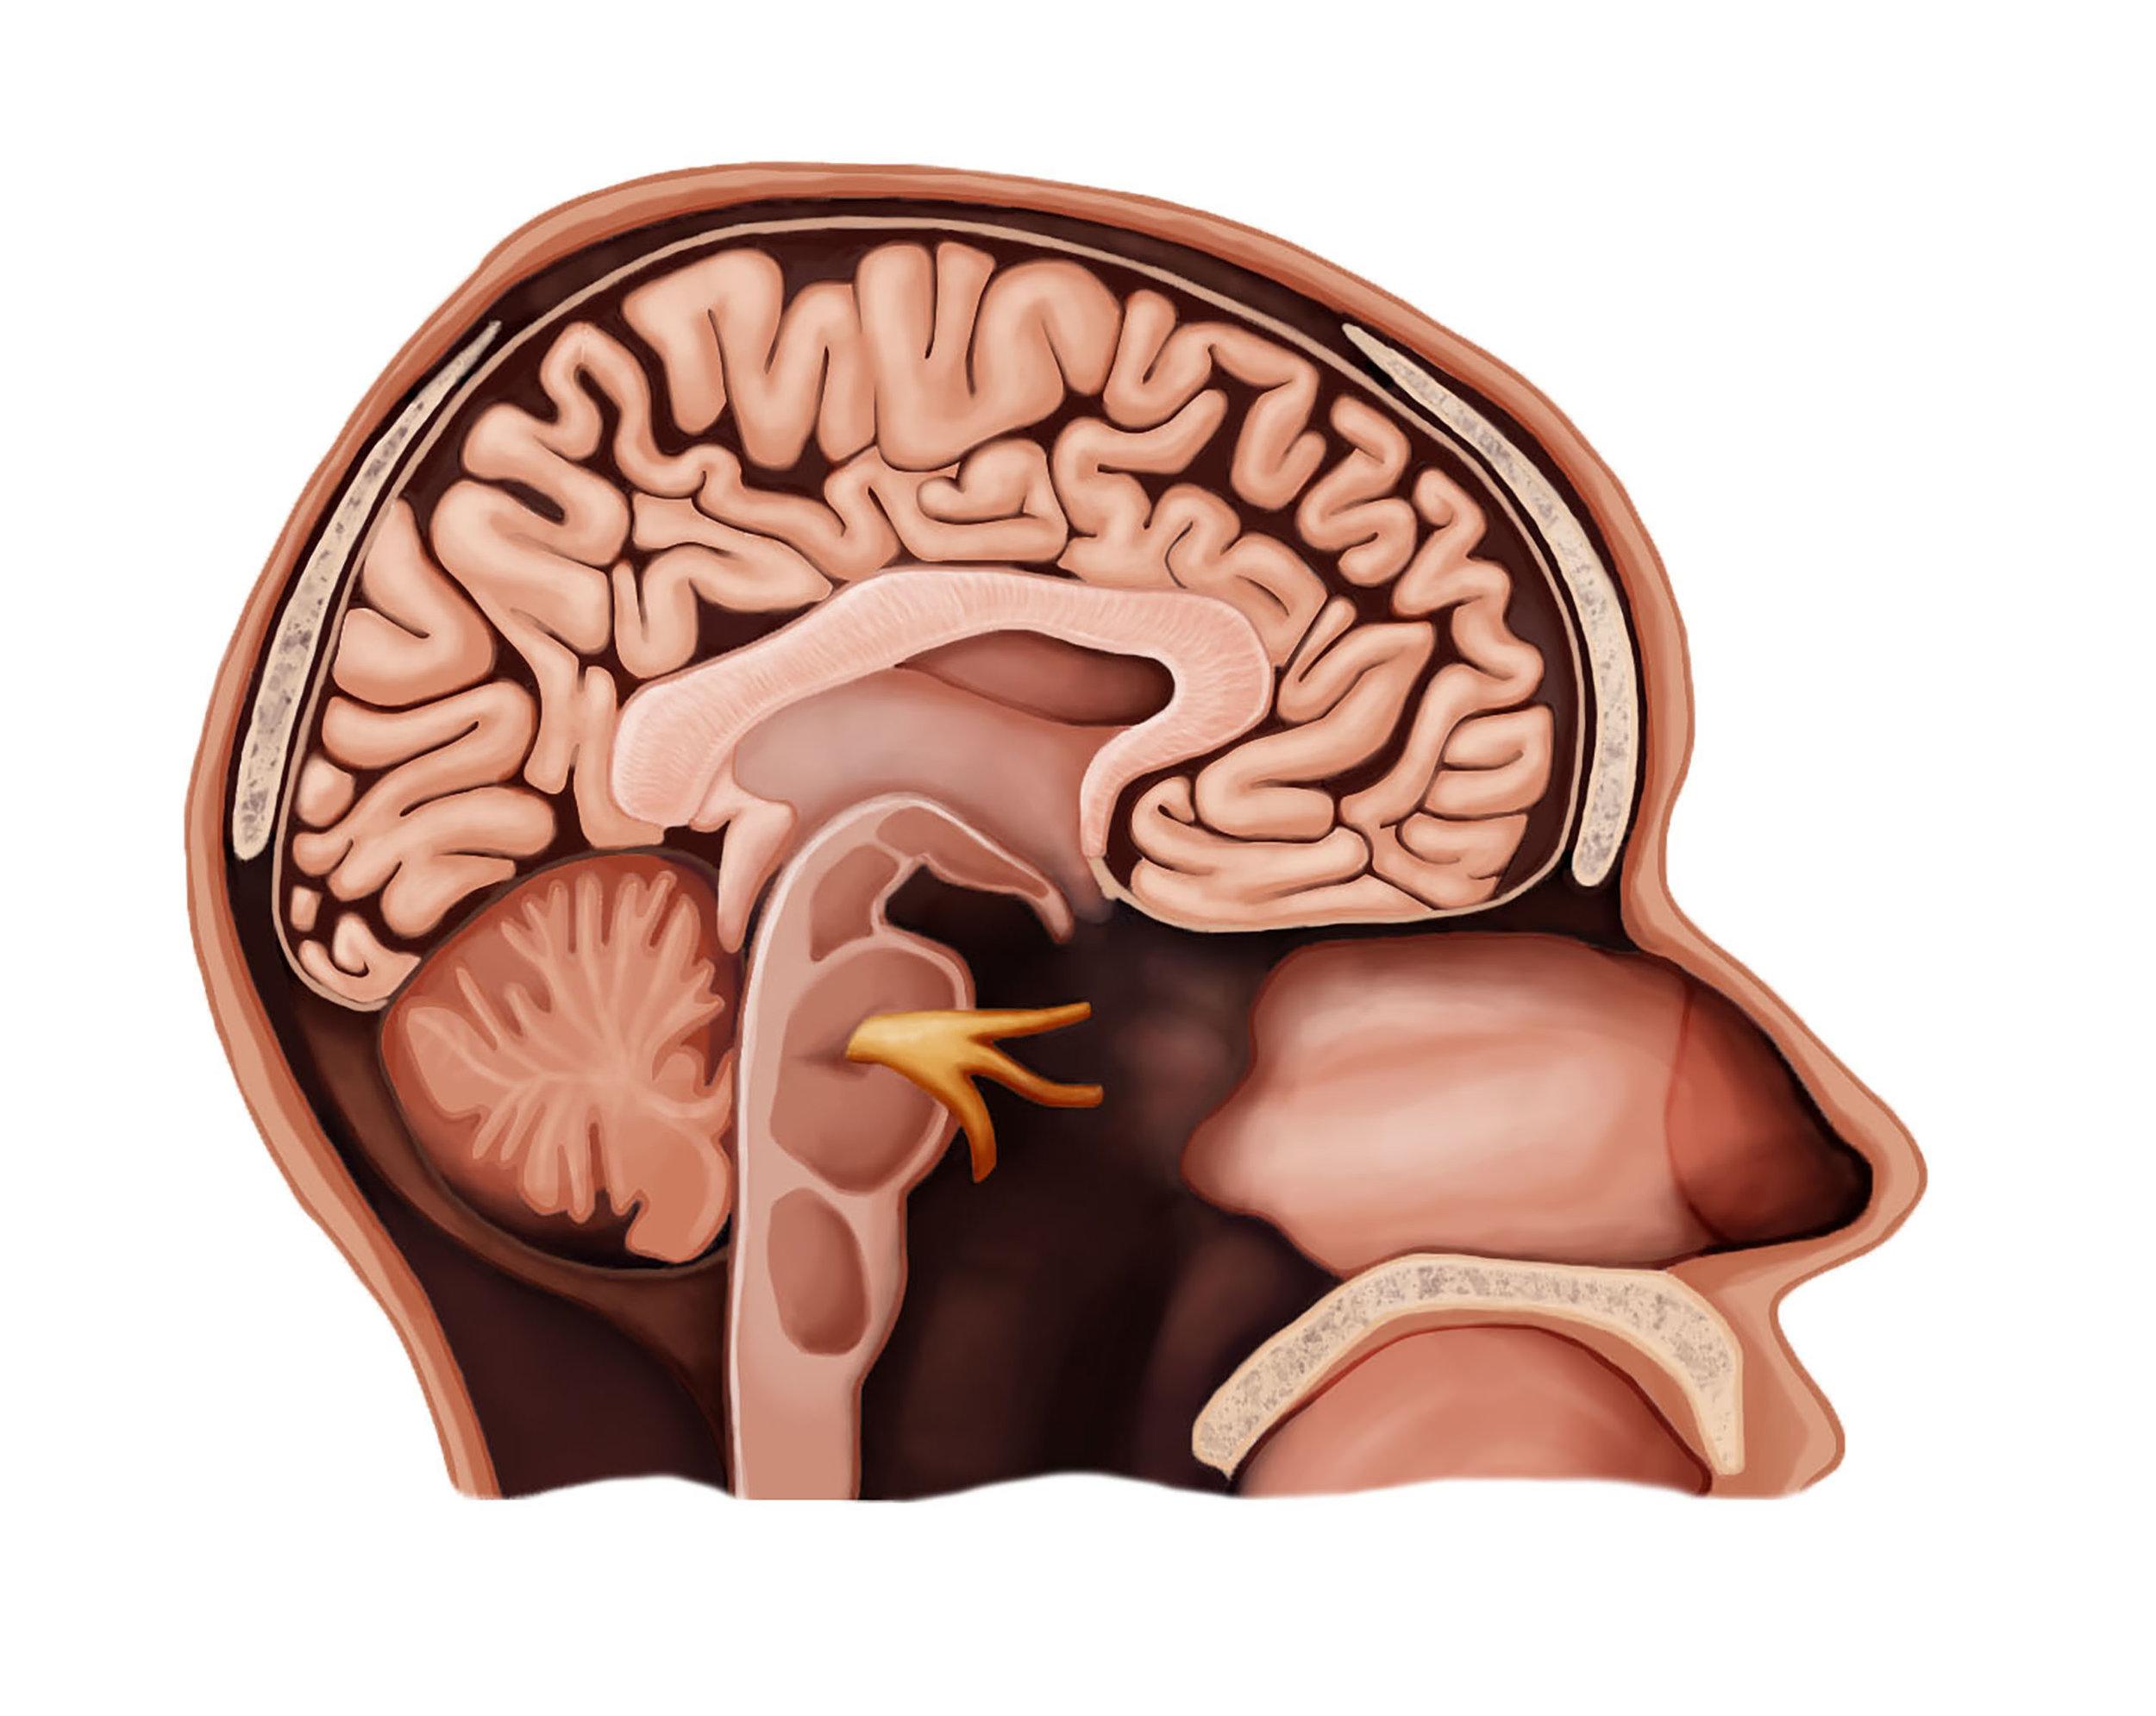 Head, Sagittal Section, Illustration